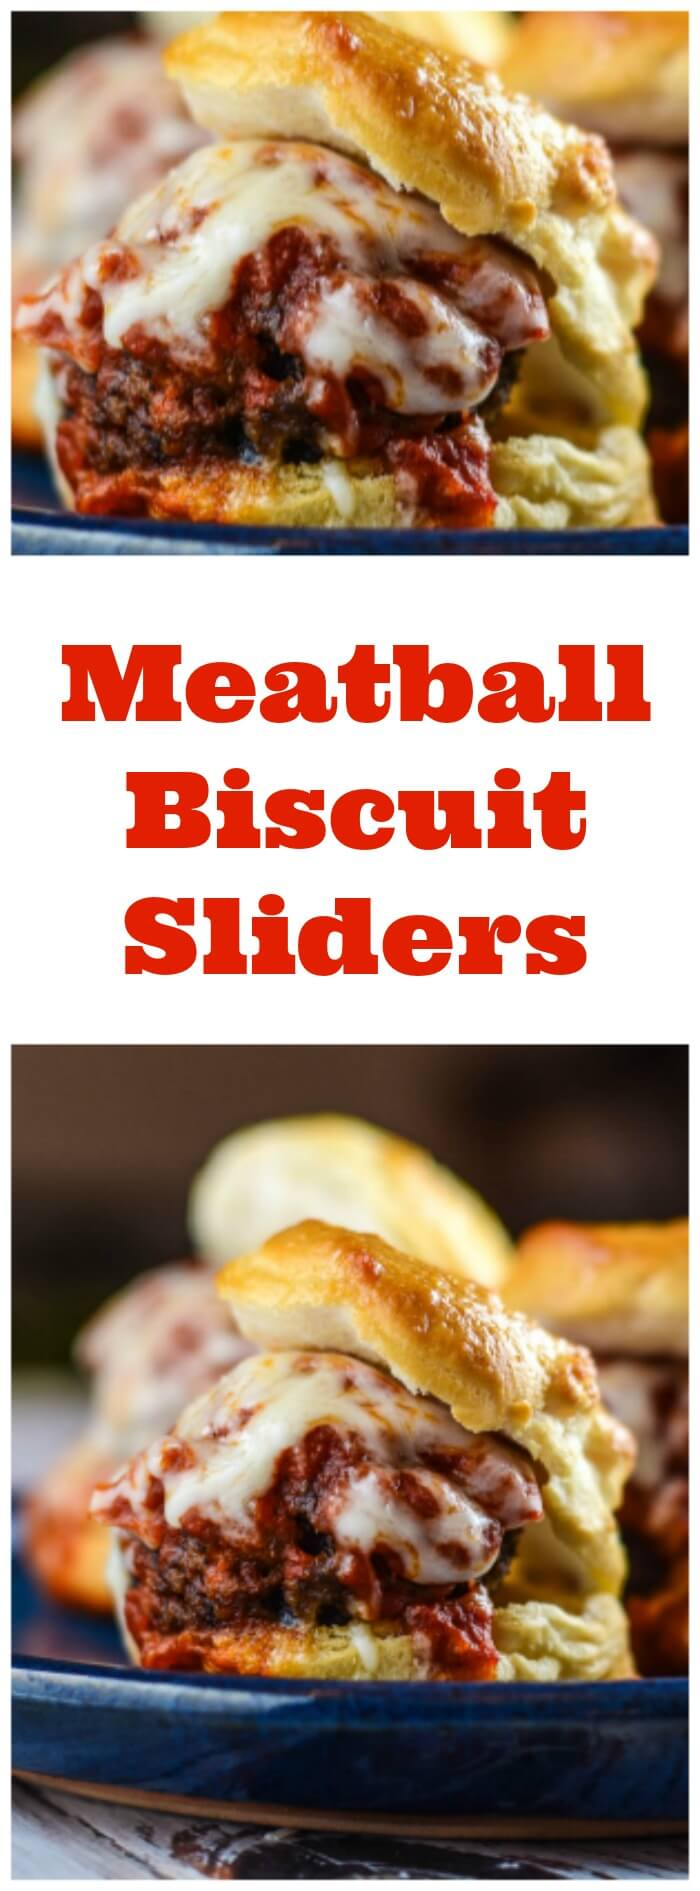 Meatball Biscuit Sliders